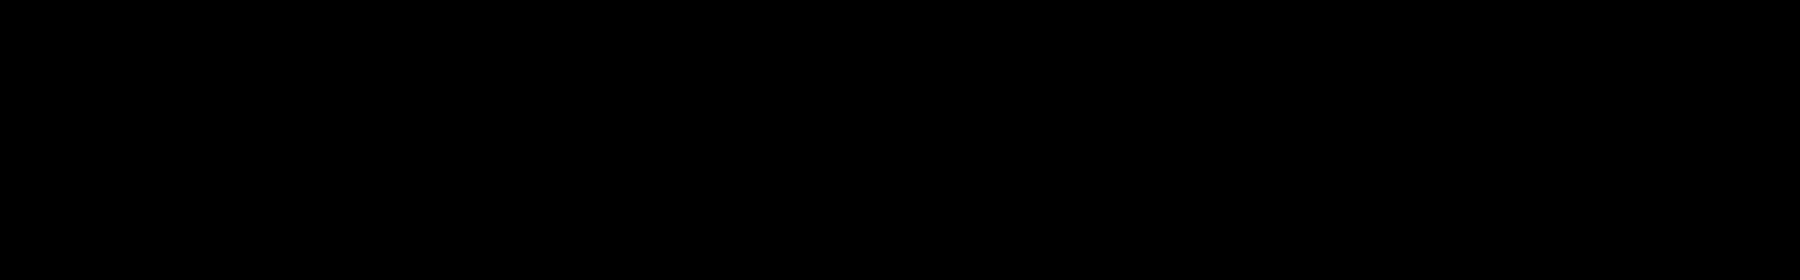 Dark Hybrid Trailer Rhythms & Loops audio waveform